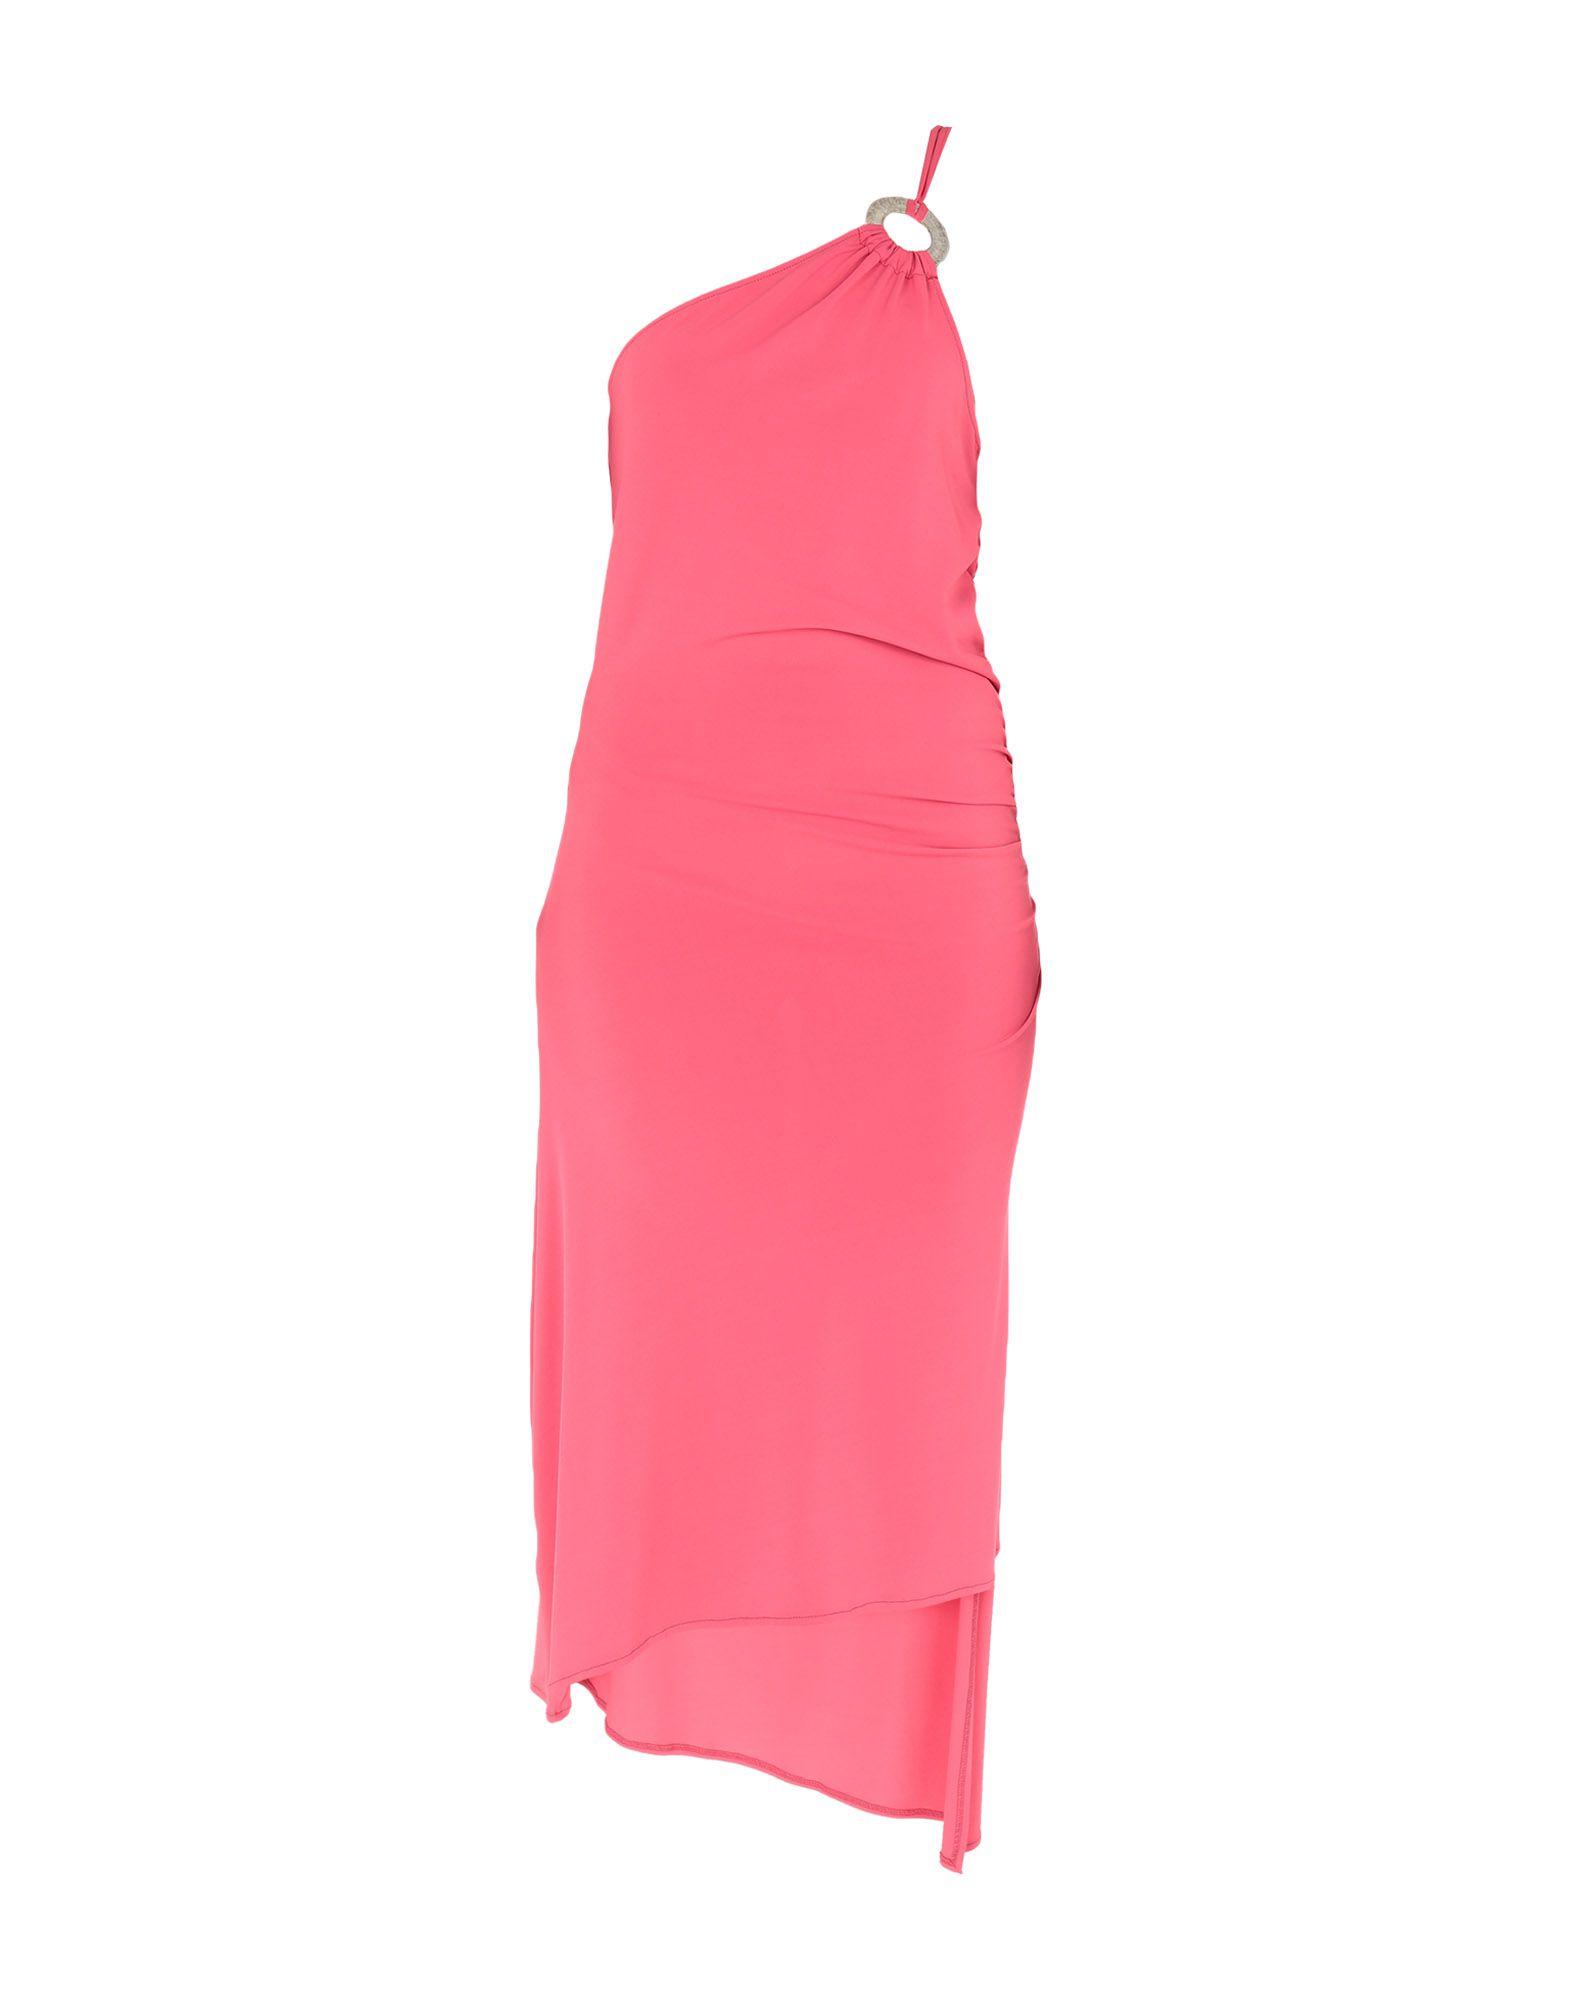 GAI MATTIOLO JEANS Платье длиной 3/4 gai mattiolo jeans pубашка